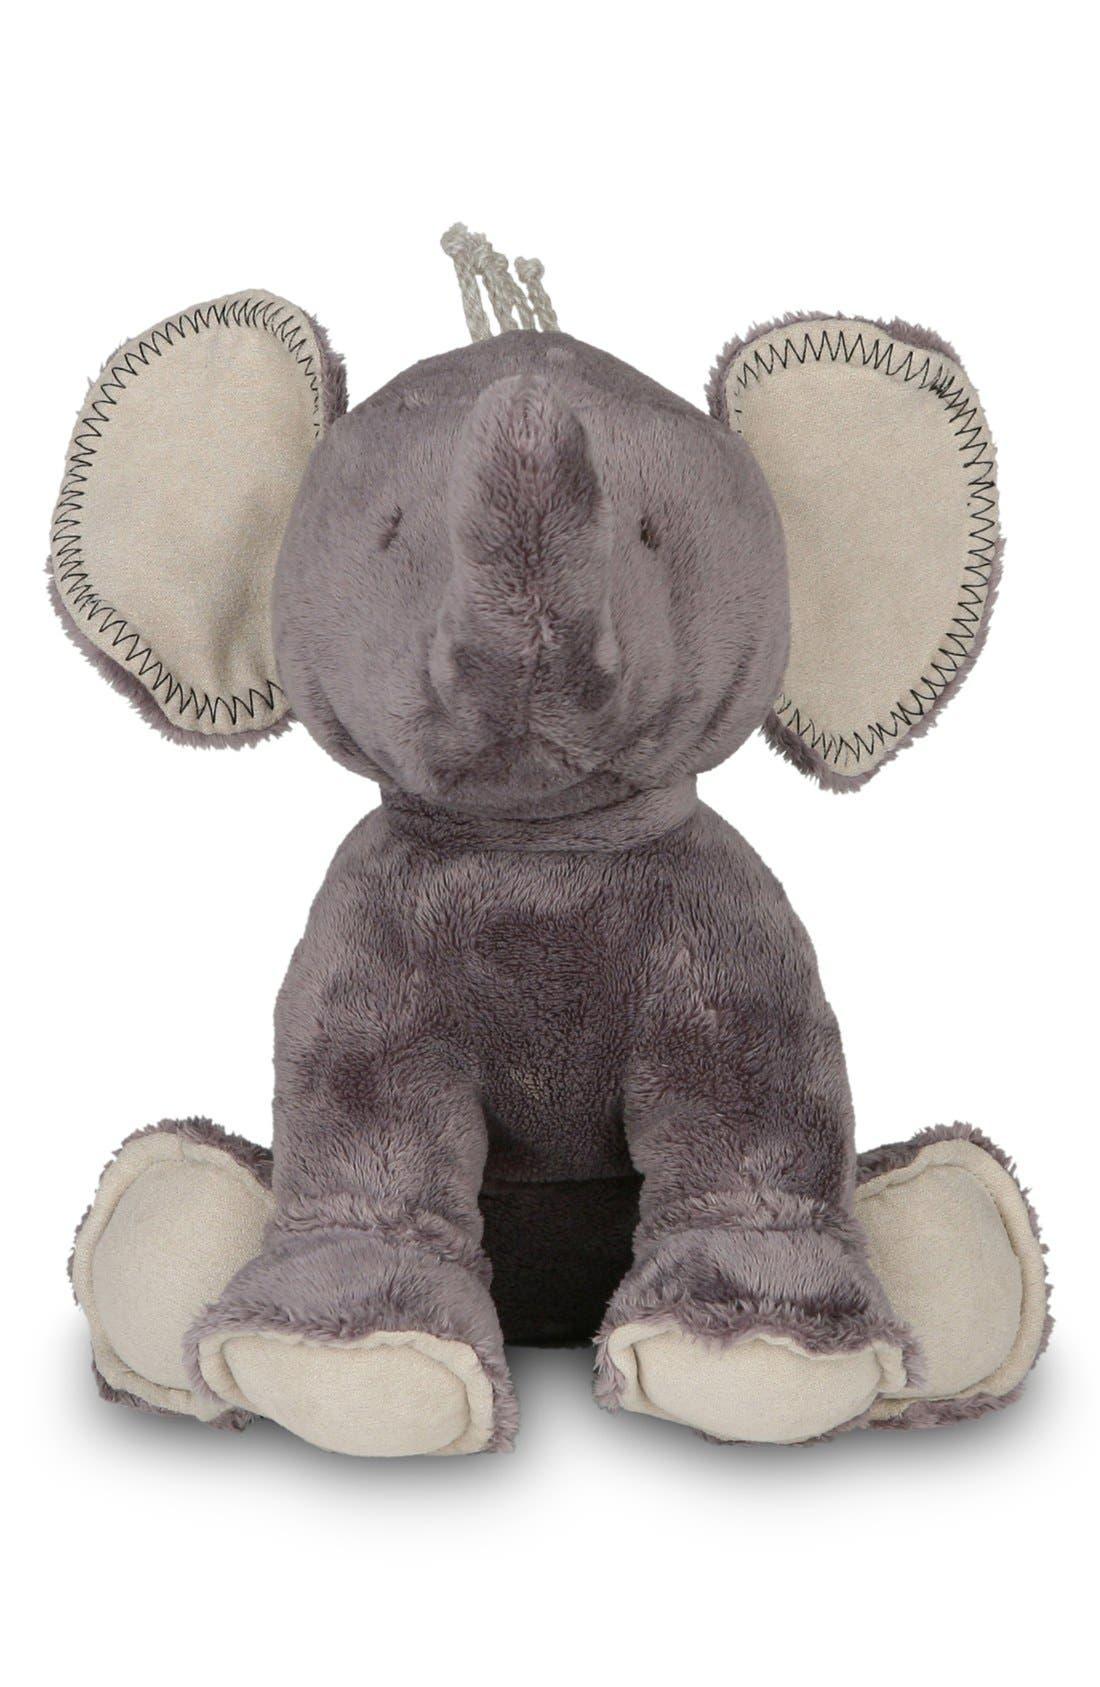 'Buddy the Elephant' Stuffed Animal,                             Main thumbnail 1, color,                             020